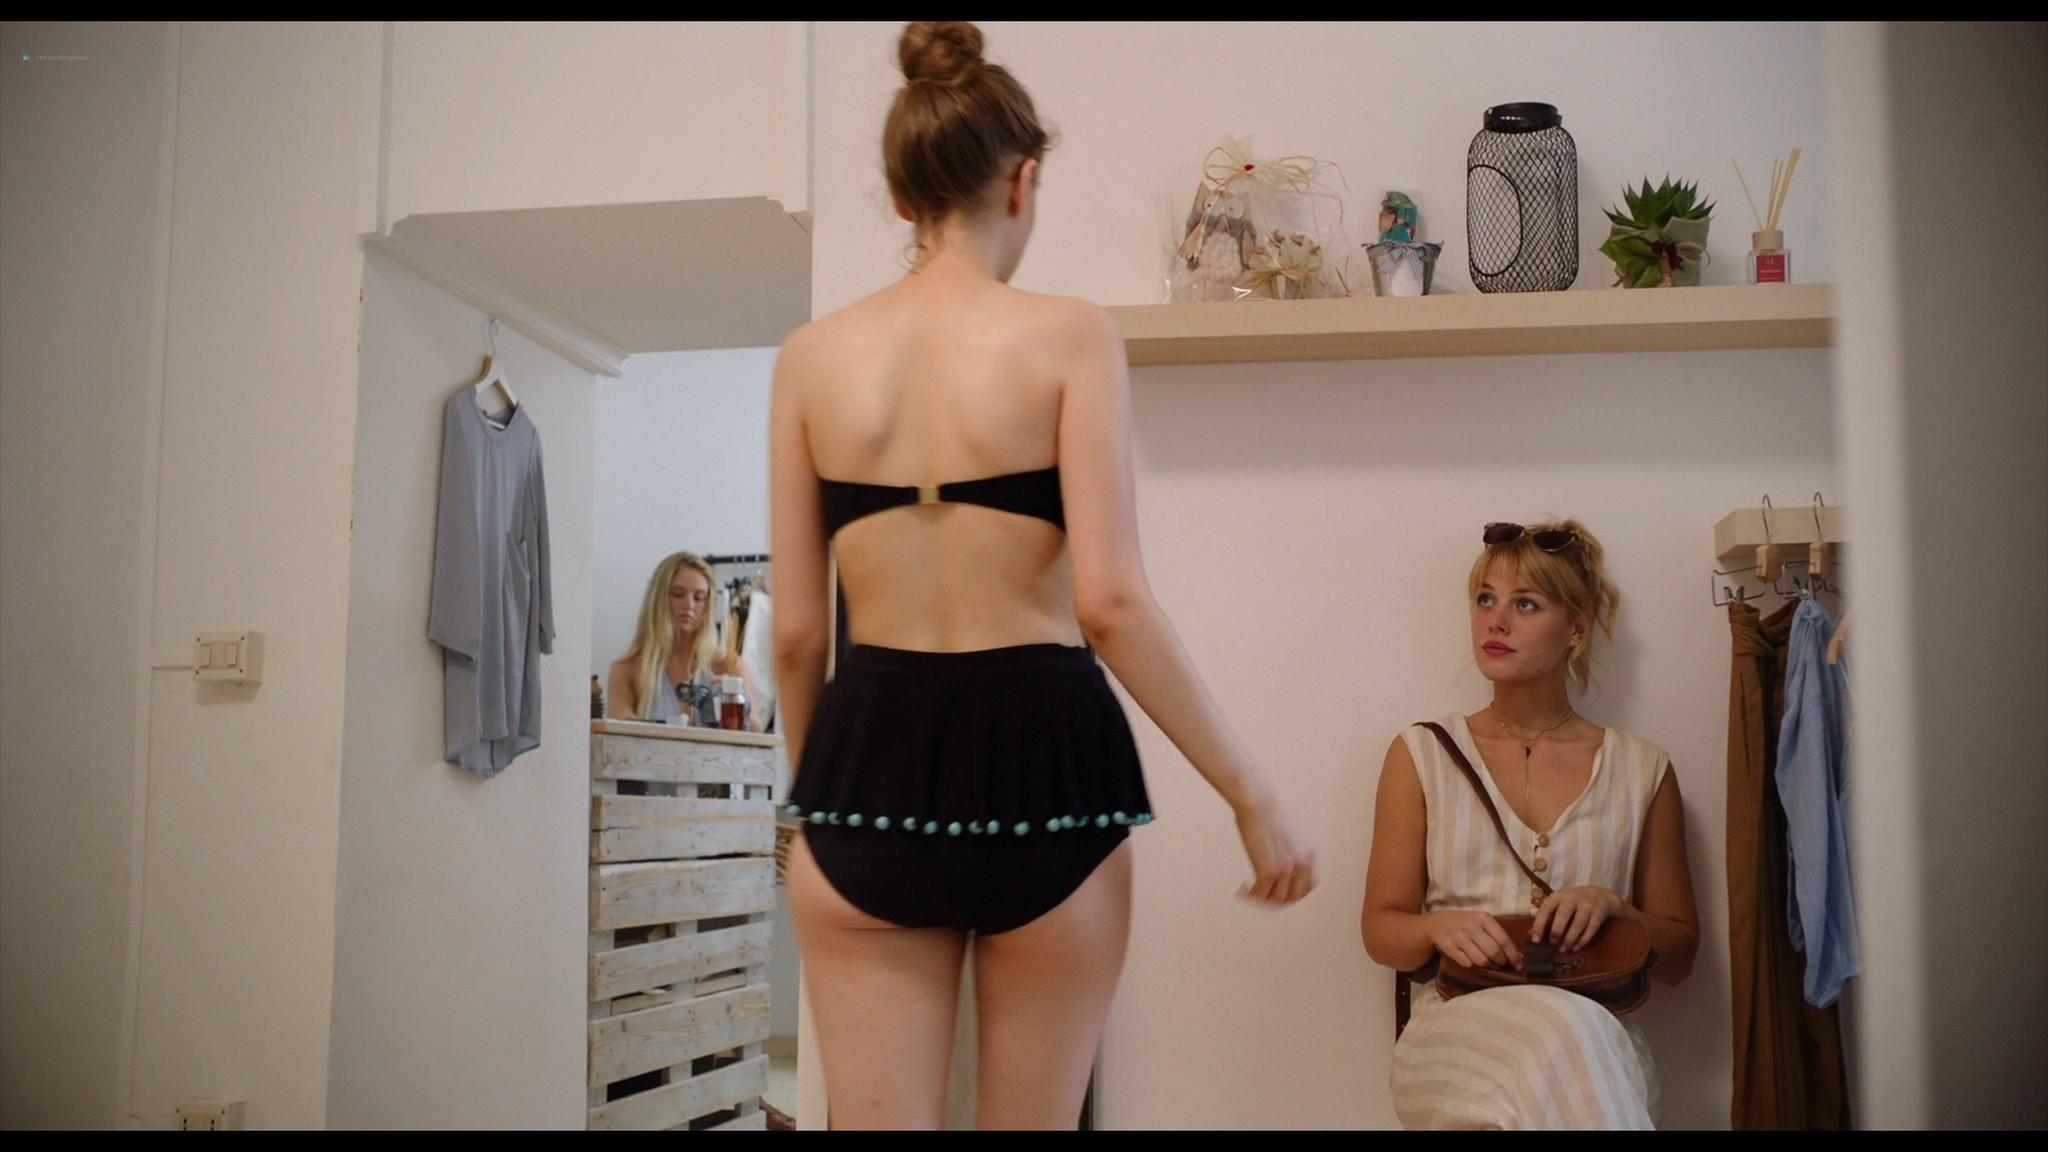 Bianca Cedrone sexy Hannah van der Westhuysen Emma Curtis hot A Little Italian Vacation 2021 1080p Web 2